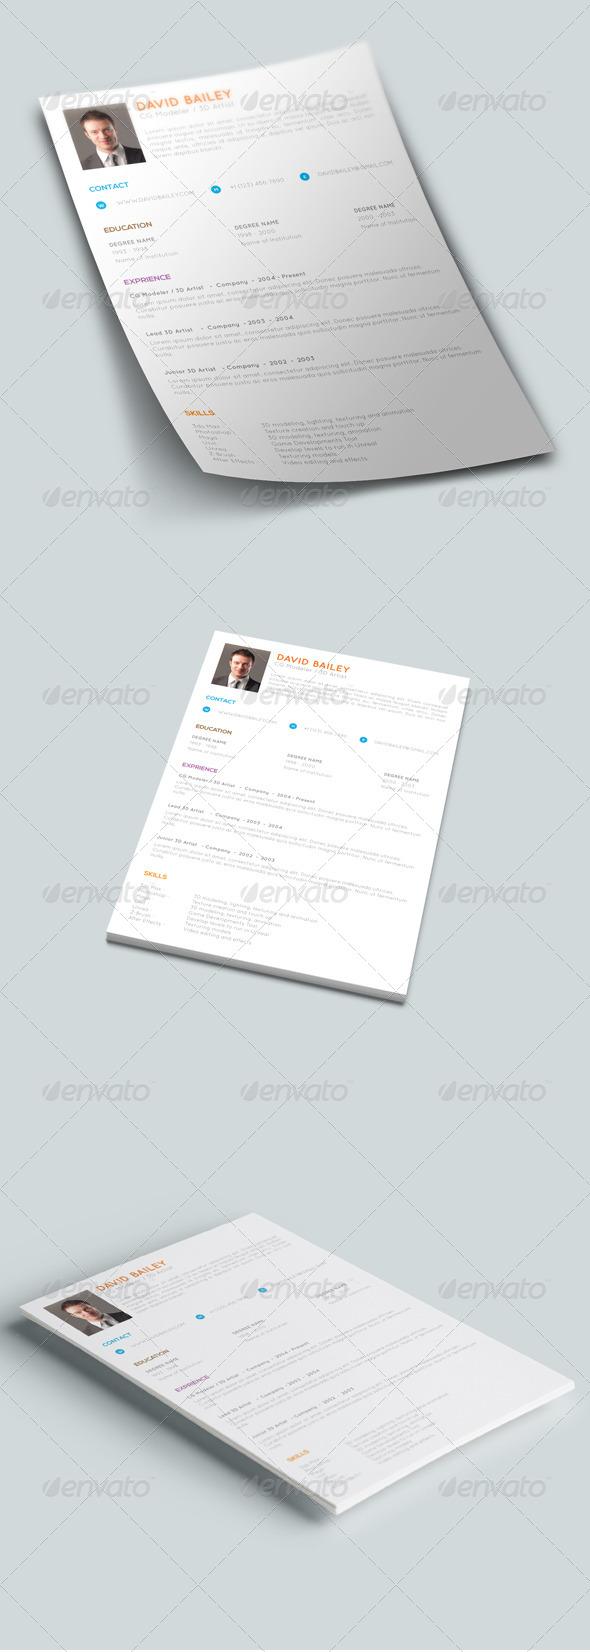 GraphicRiver Clean & Creative Resume 7813006